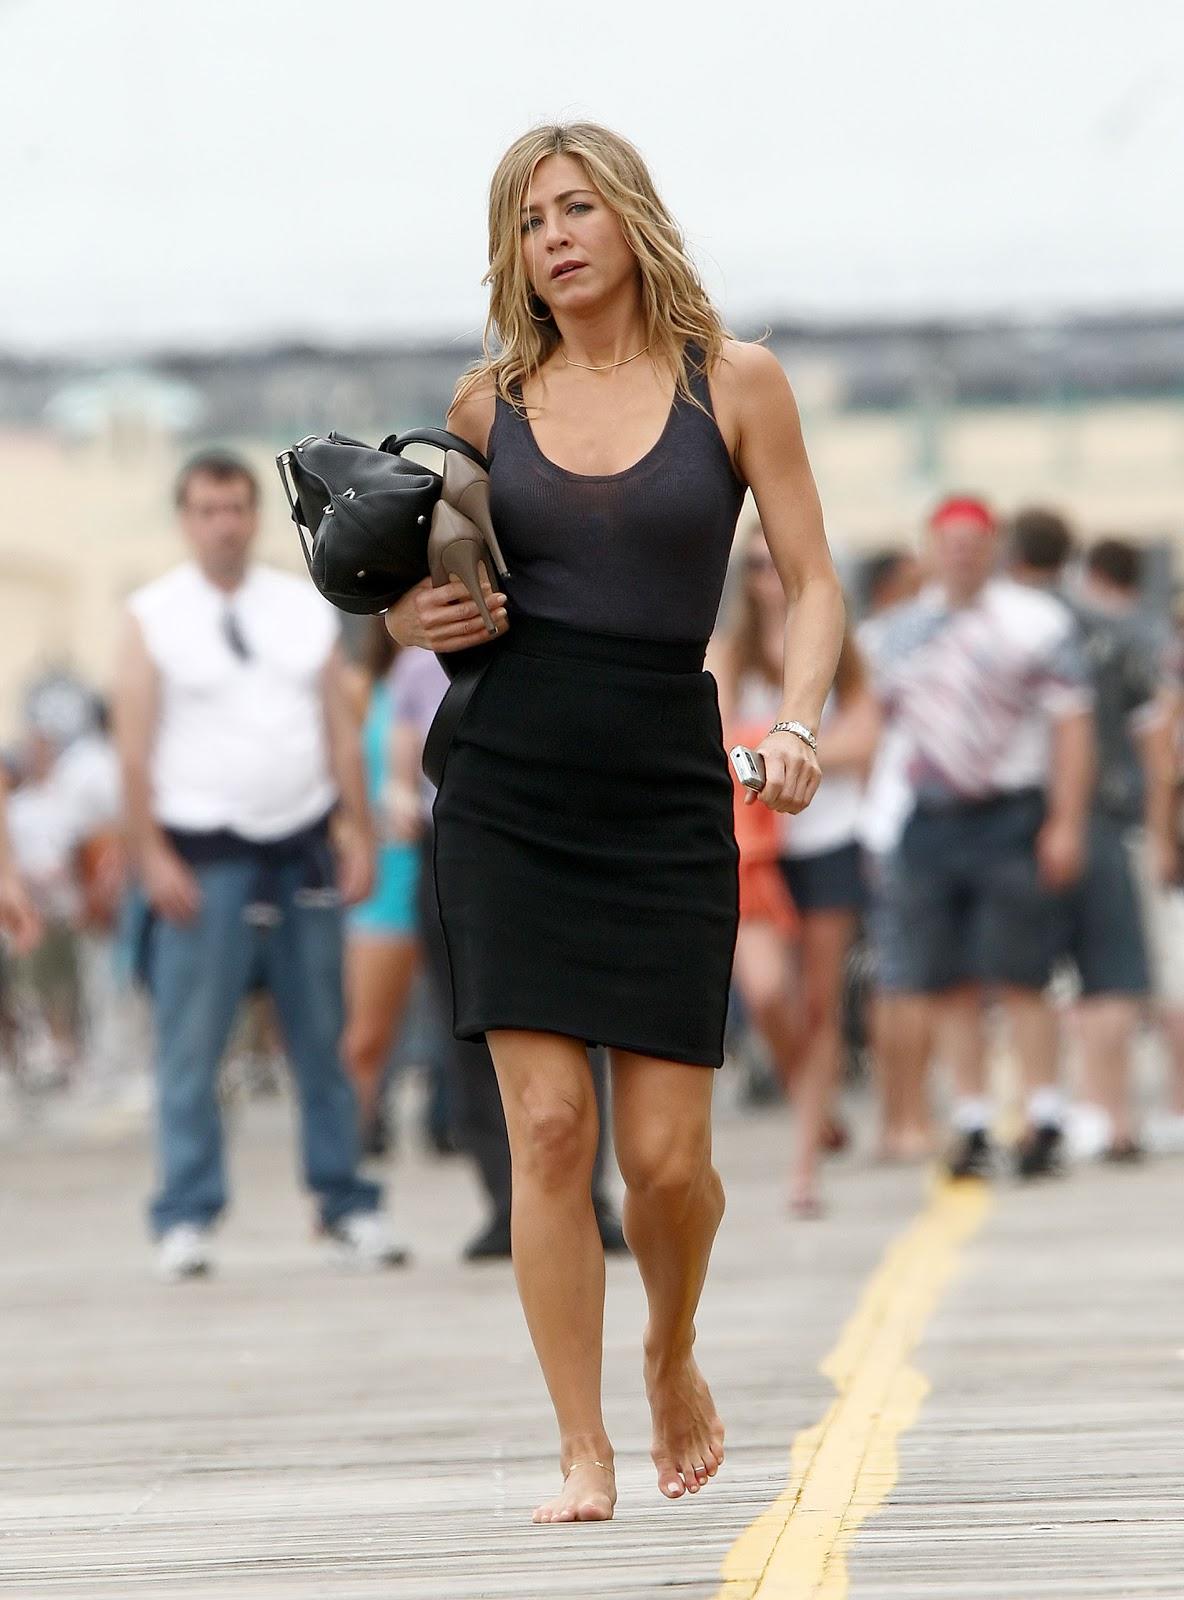 http://3.bp.blogspot.com/-Gc7r74ct9z8/TxHW8CE0RfI/AAAAAAAAAhE/sHL_w-fH9f4/s1600/Jennifer-Aniston-Feet-306414.jpg